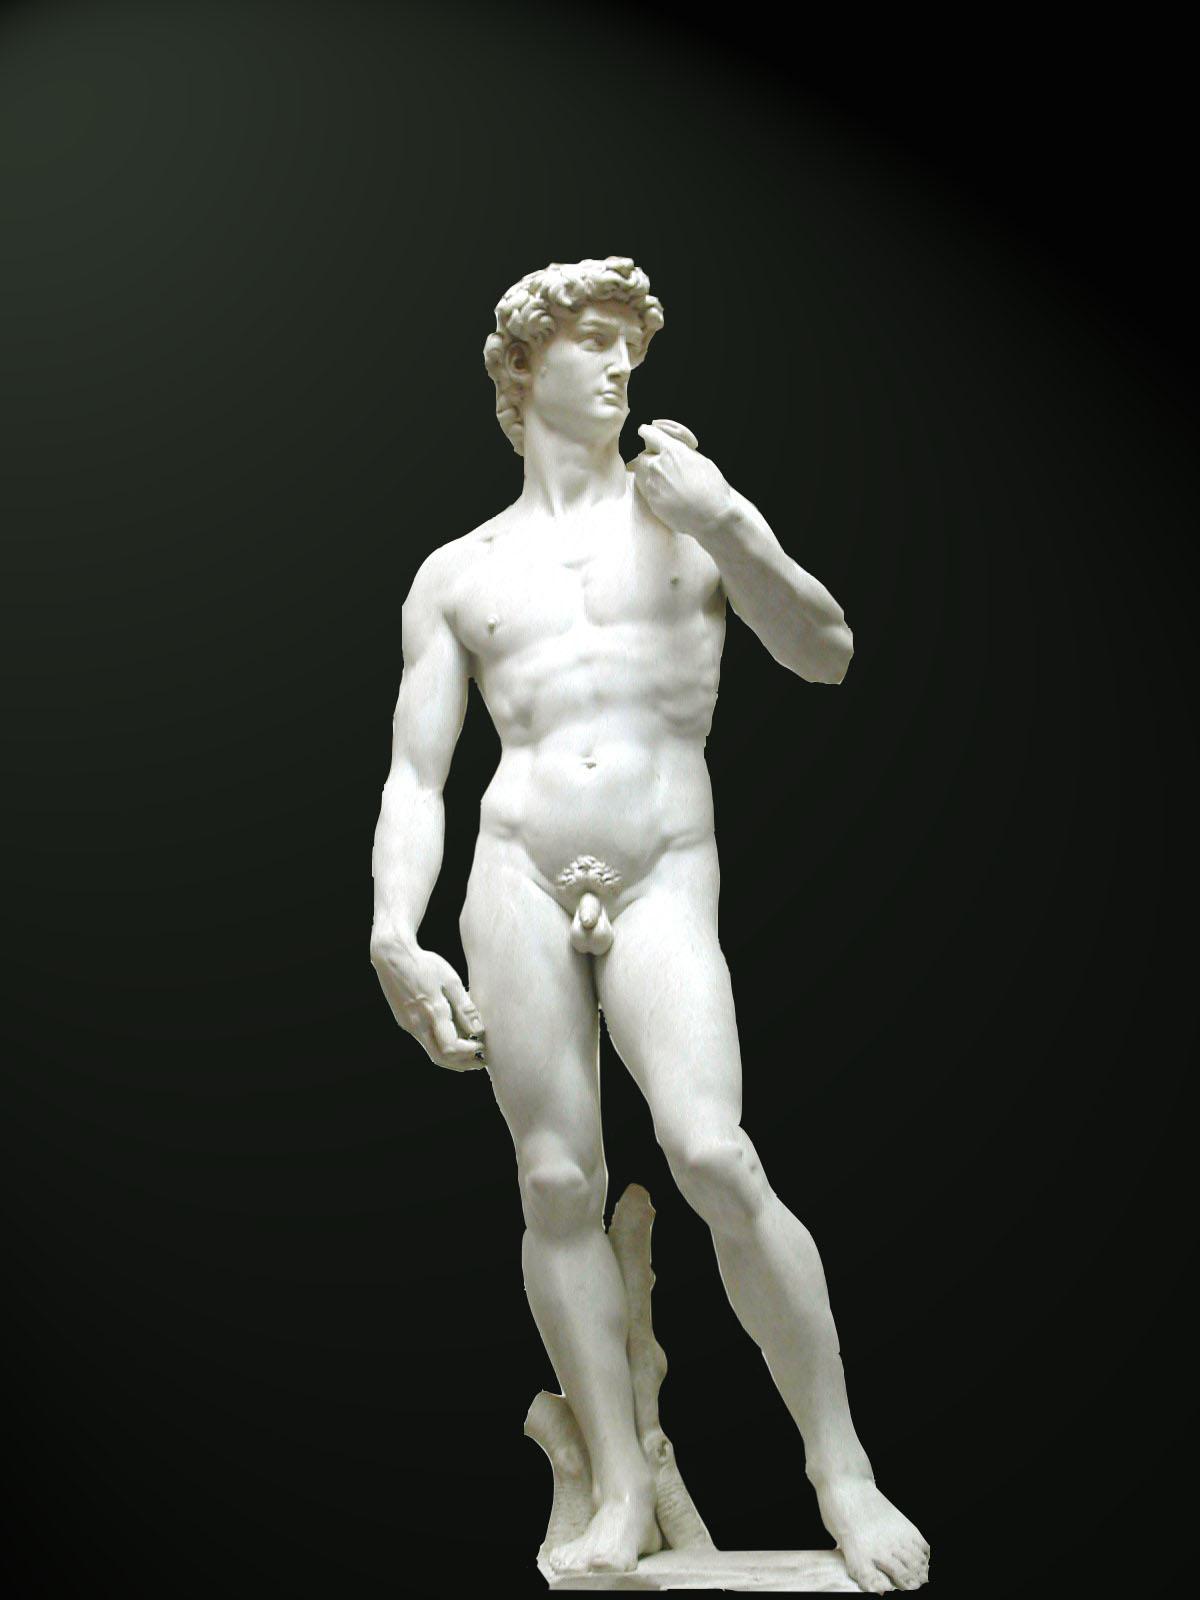 микеланджело буонарроти произведения фото